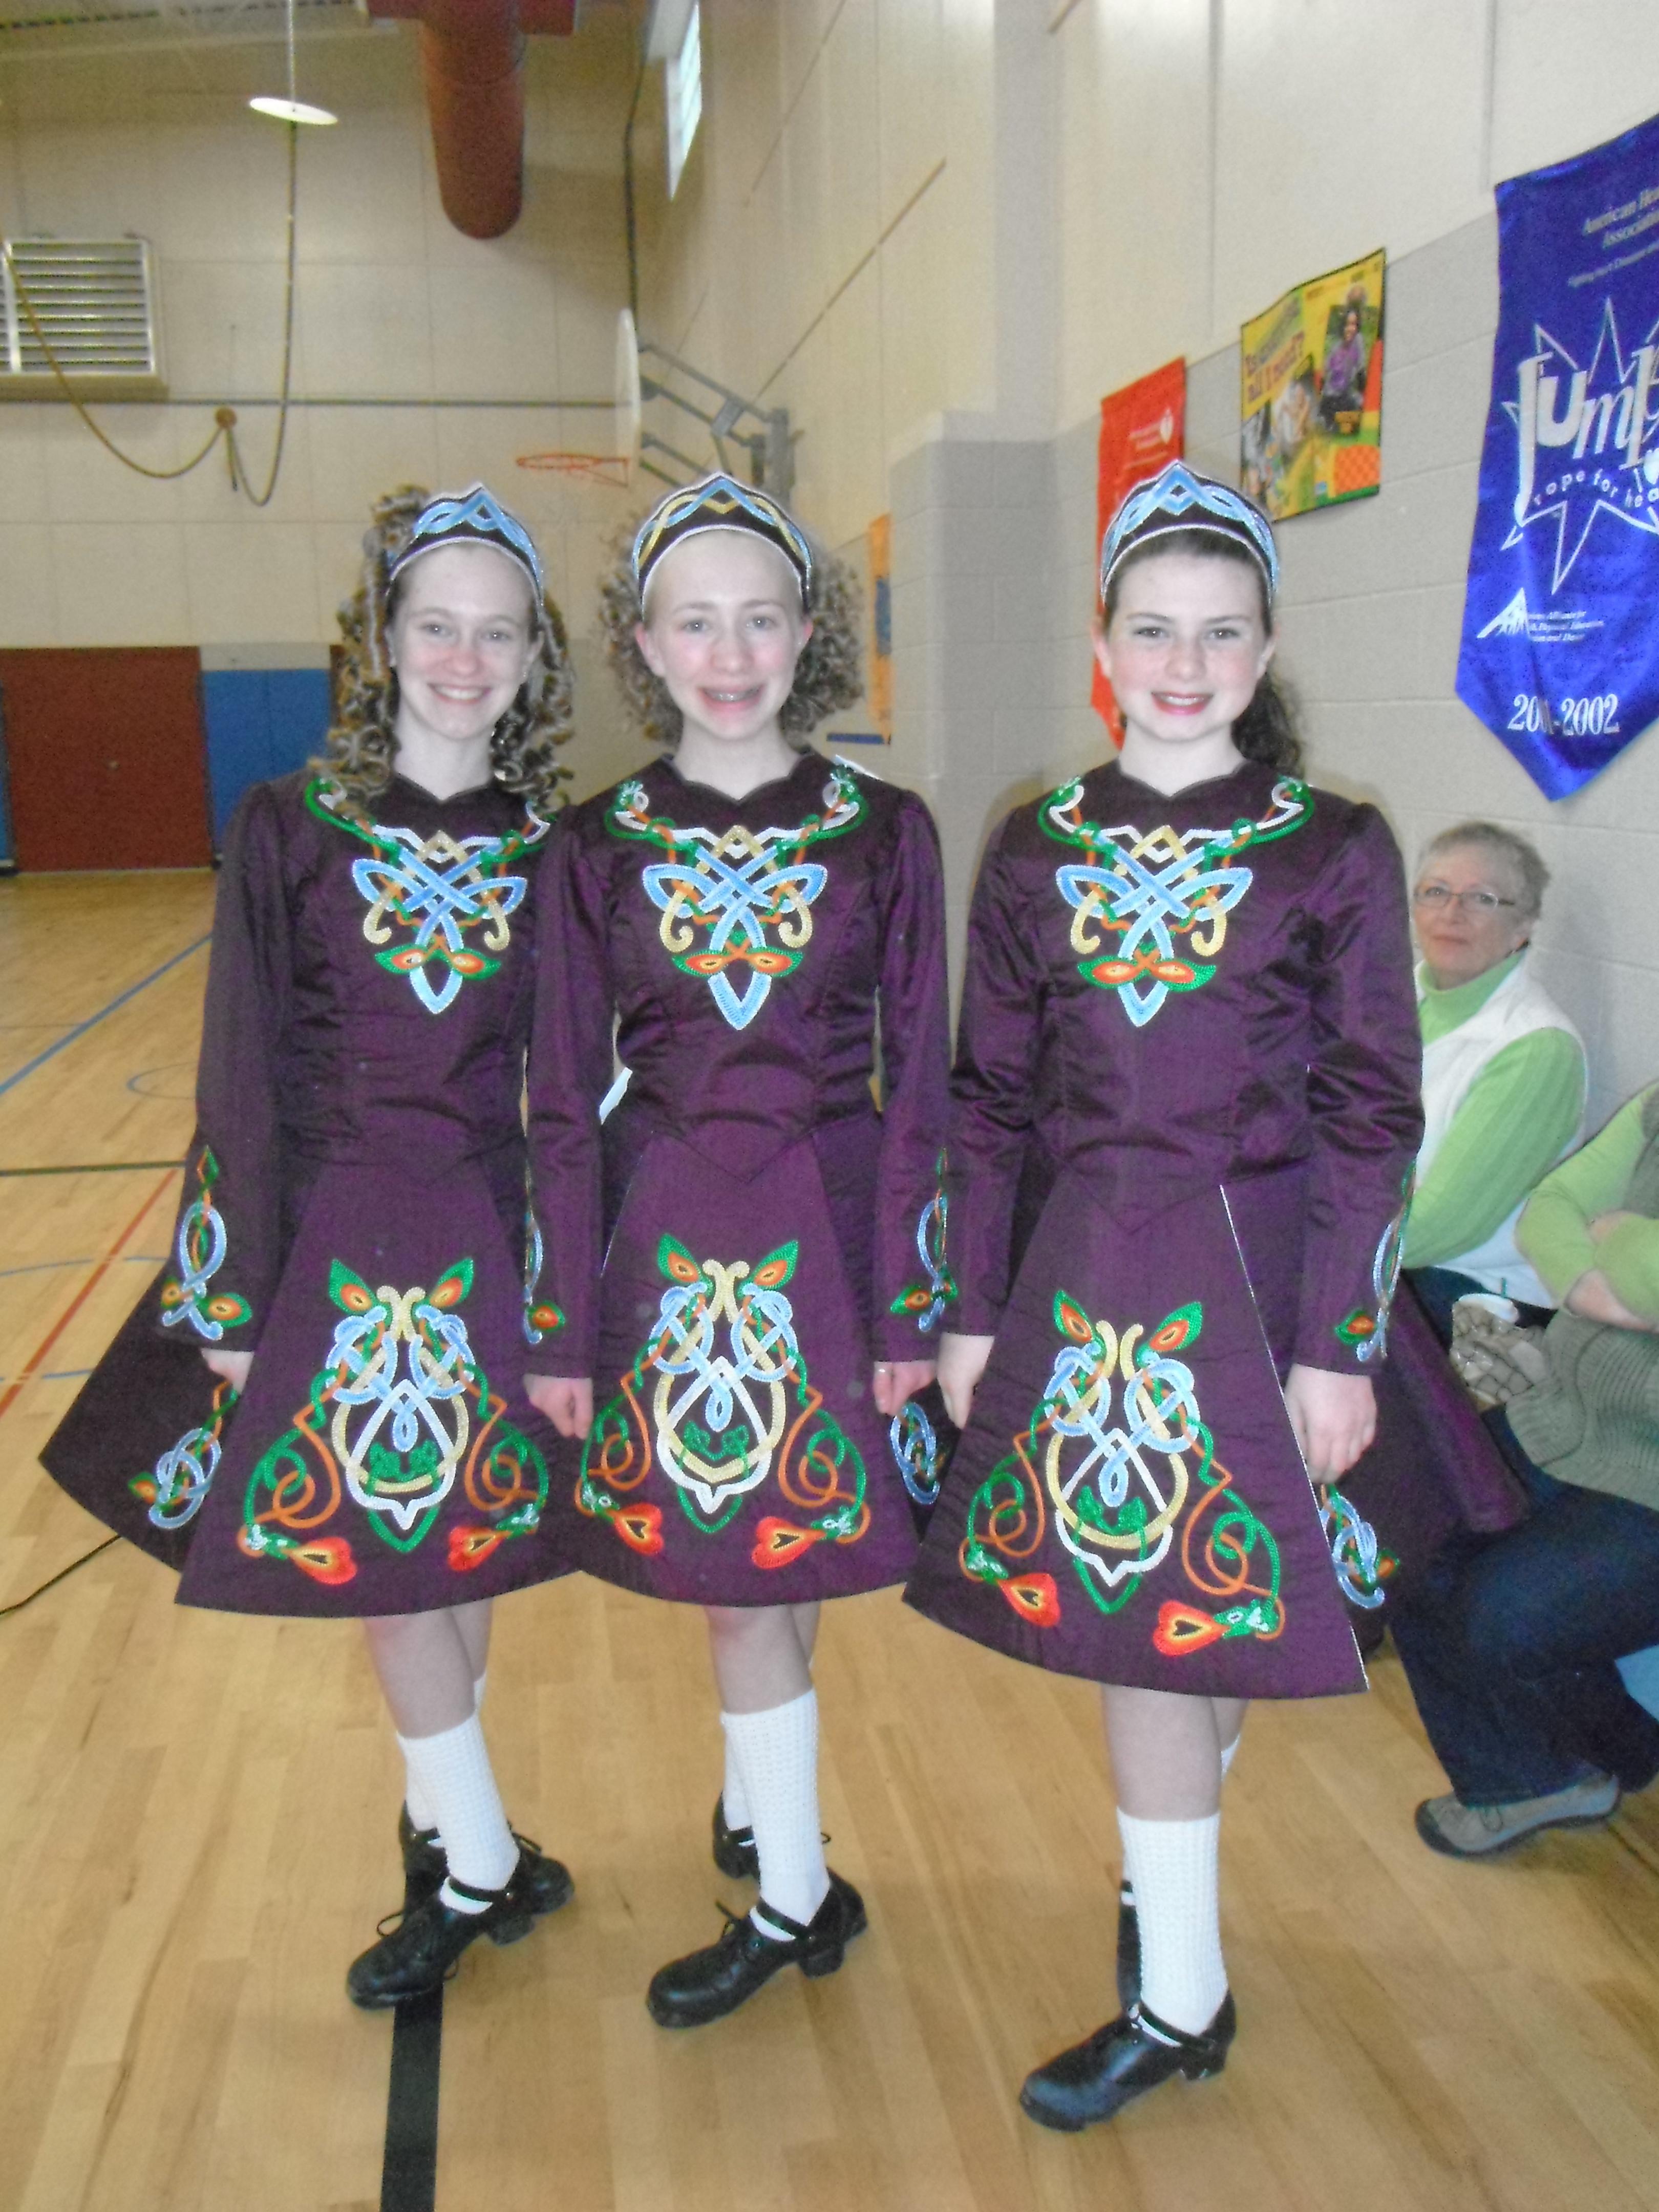 St. Patrick's Day School Tour 2012